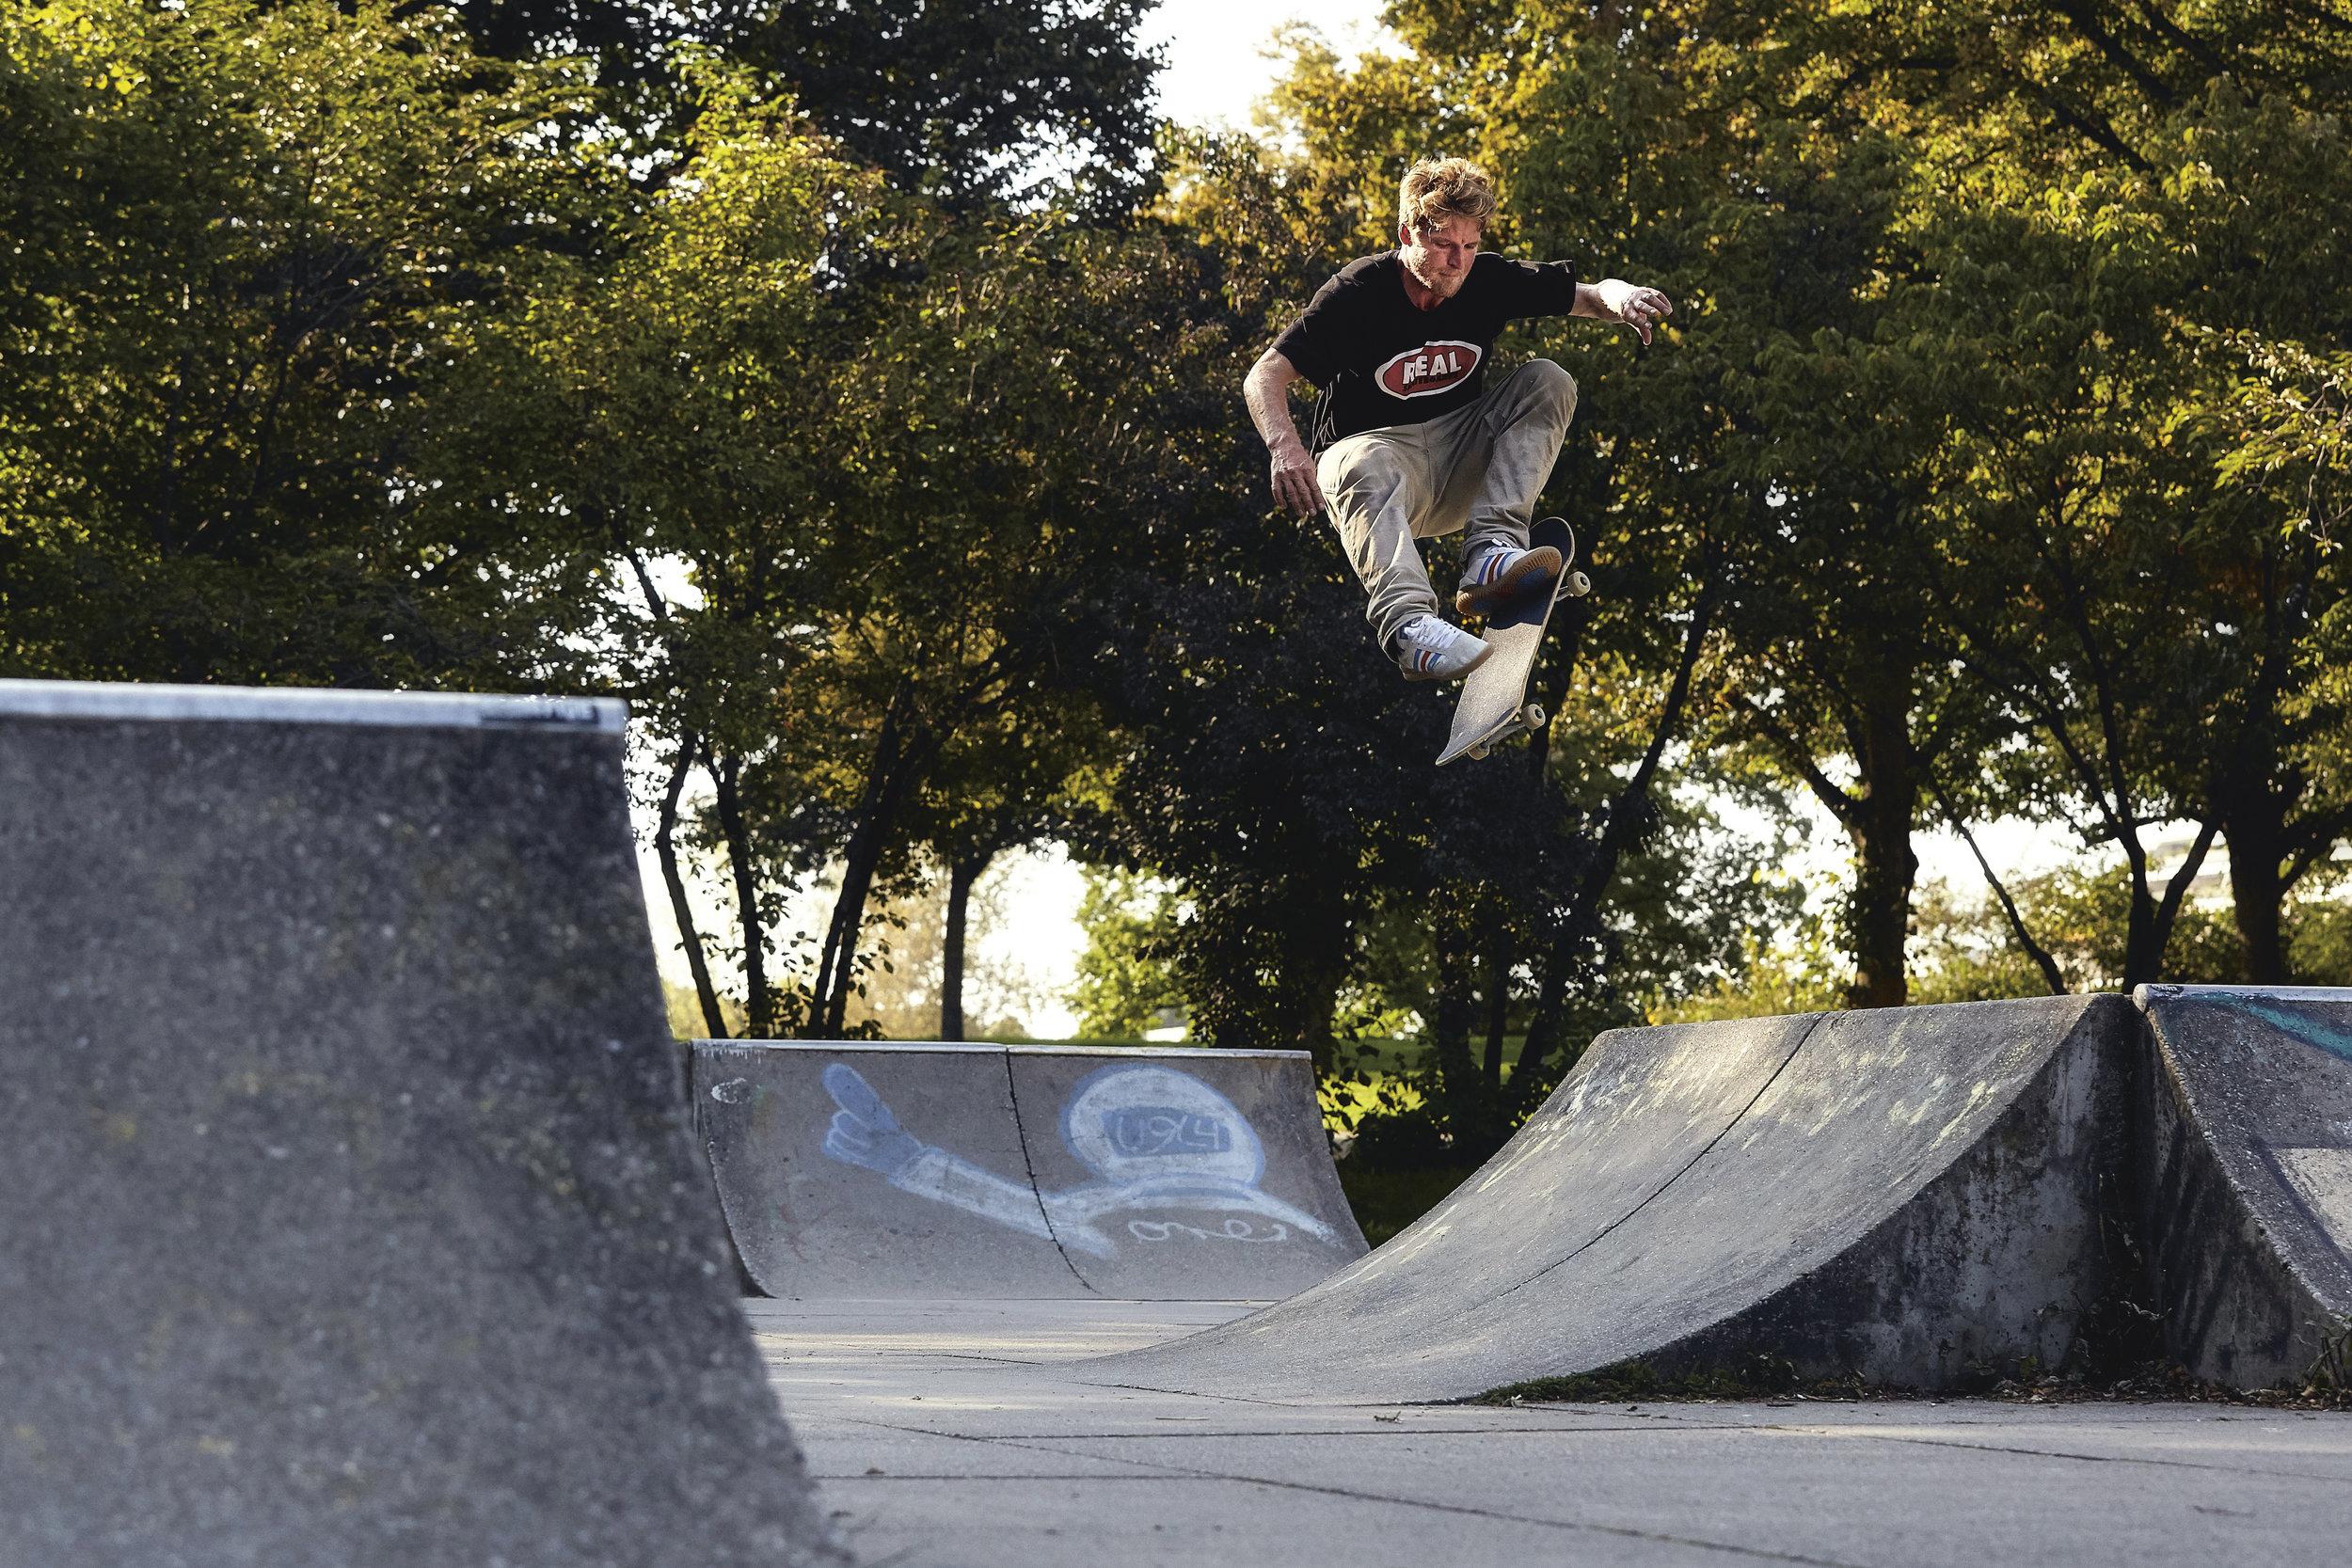 FS Kickflip → Photo by Conny Mirbach